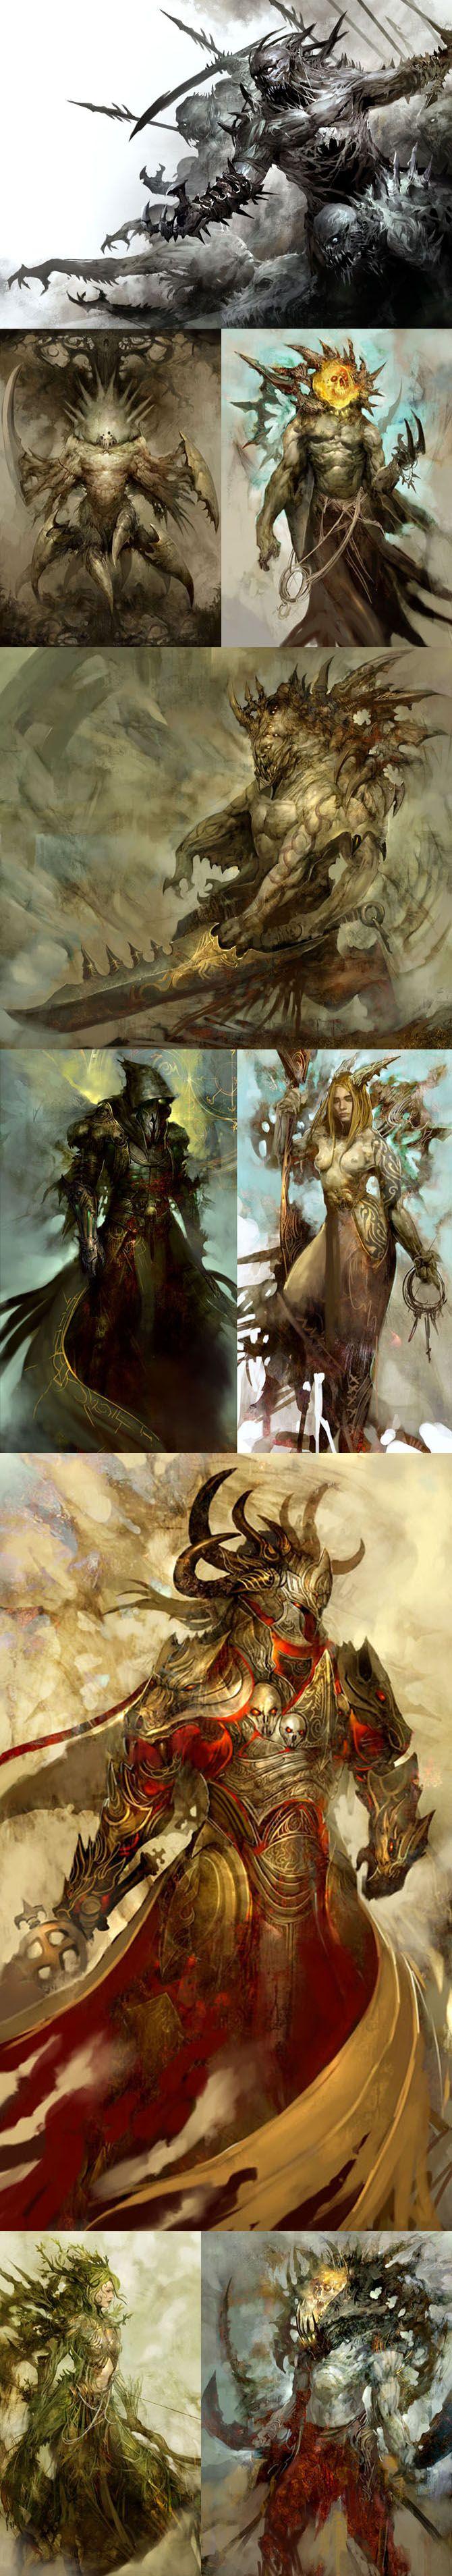 Awesome monsters for a Dark Fantasy scenario... (Kekai Kotaki) - courtesy of the design team of Guild Wars (GW concept art).